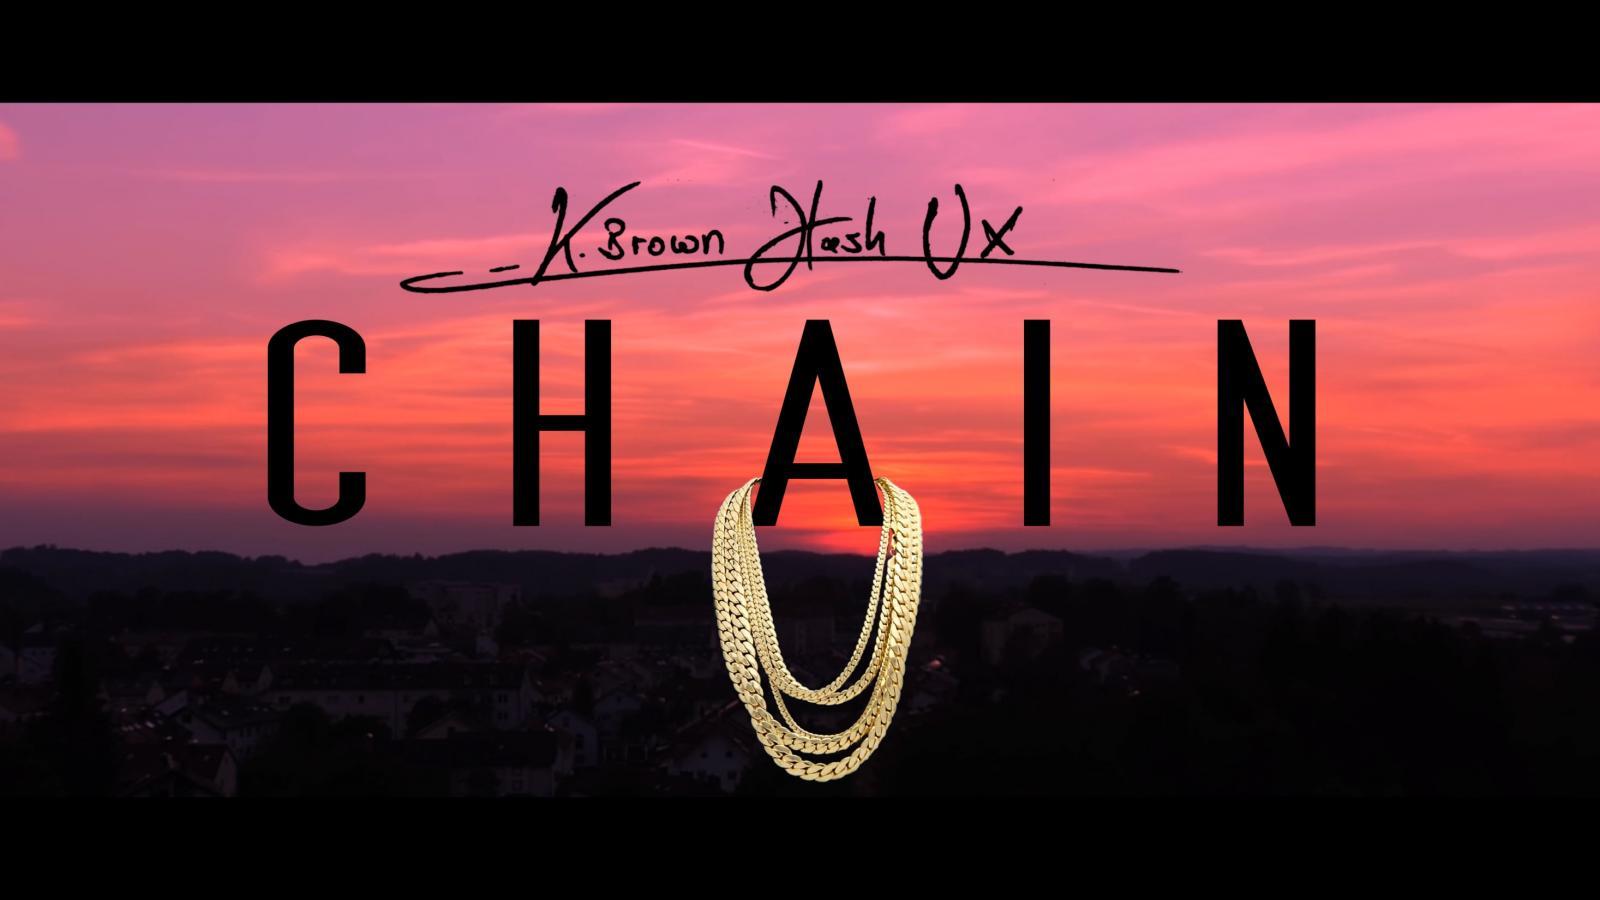 Upcoming: K.BROWN X HASH X UX - CHAIN